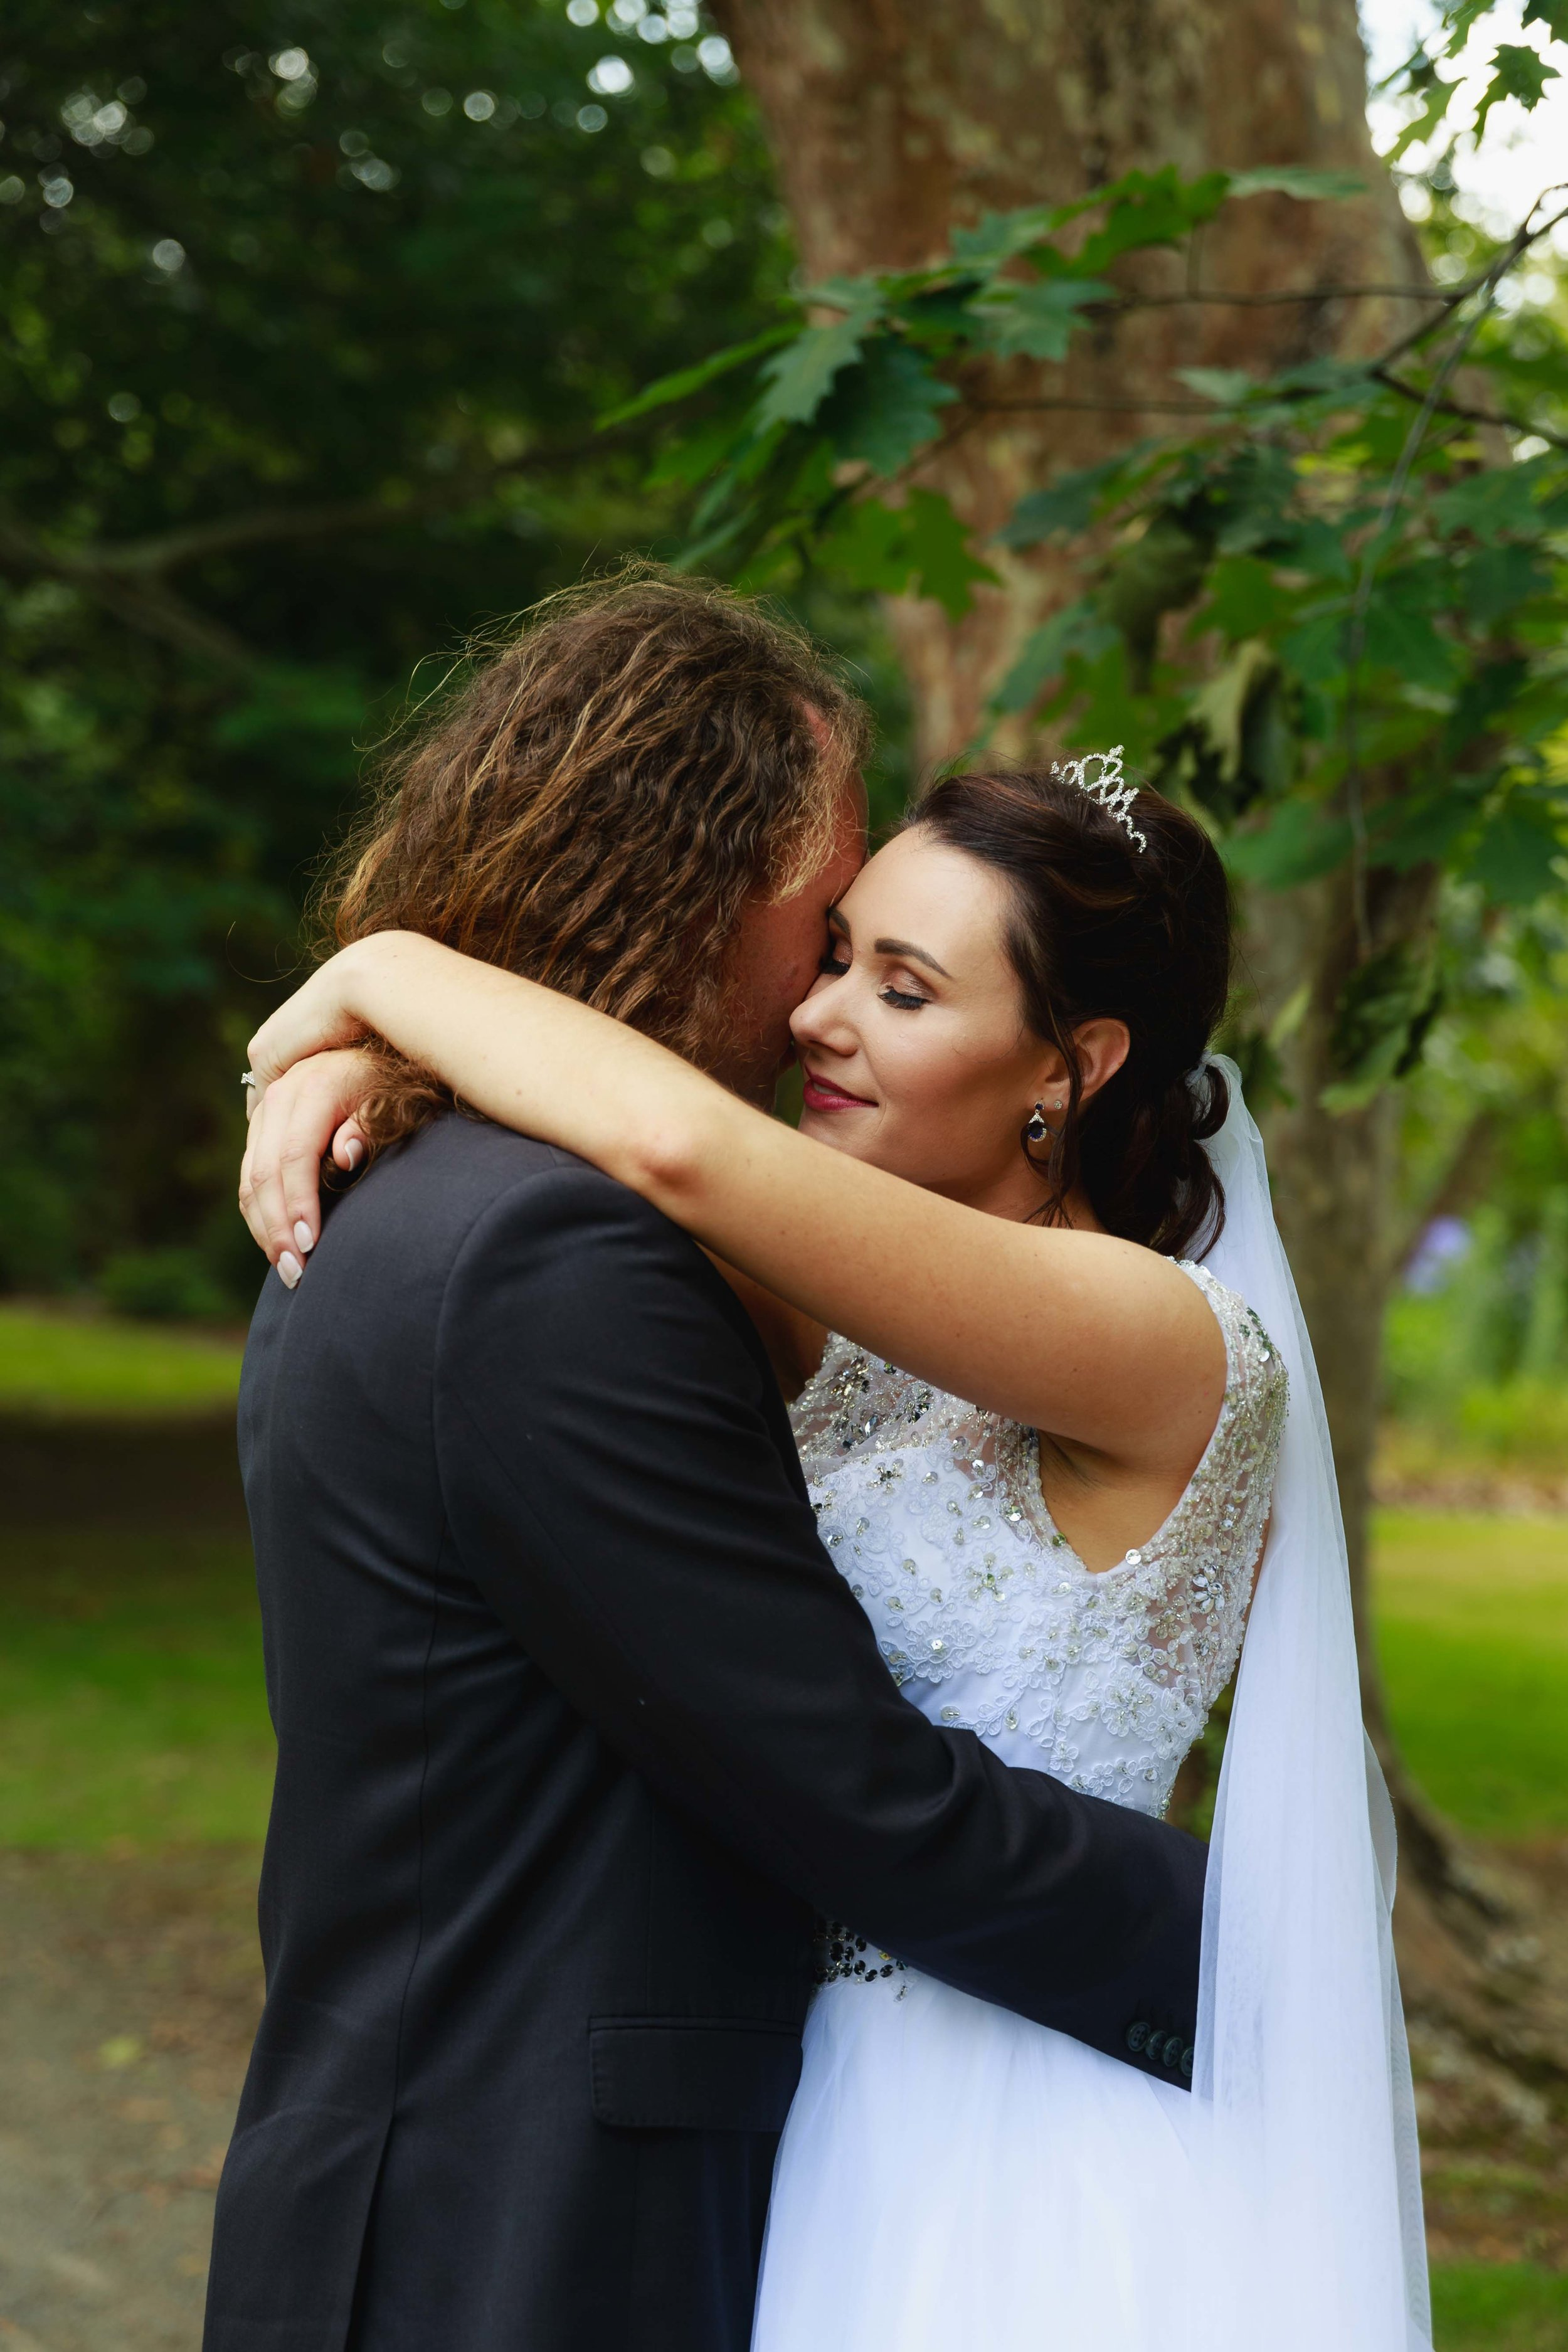 the-chalet-highlight-wedding-photography-palmerston-north-141.jpg